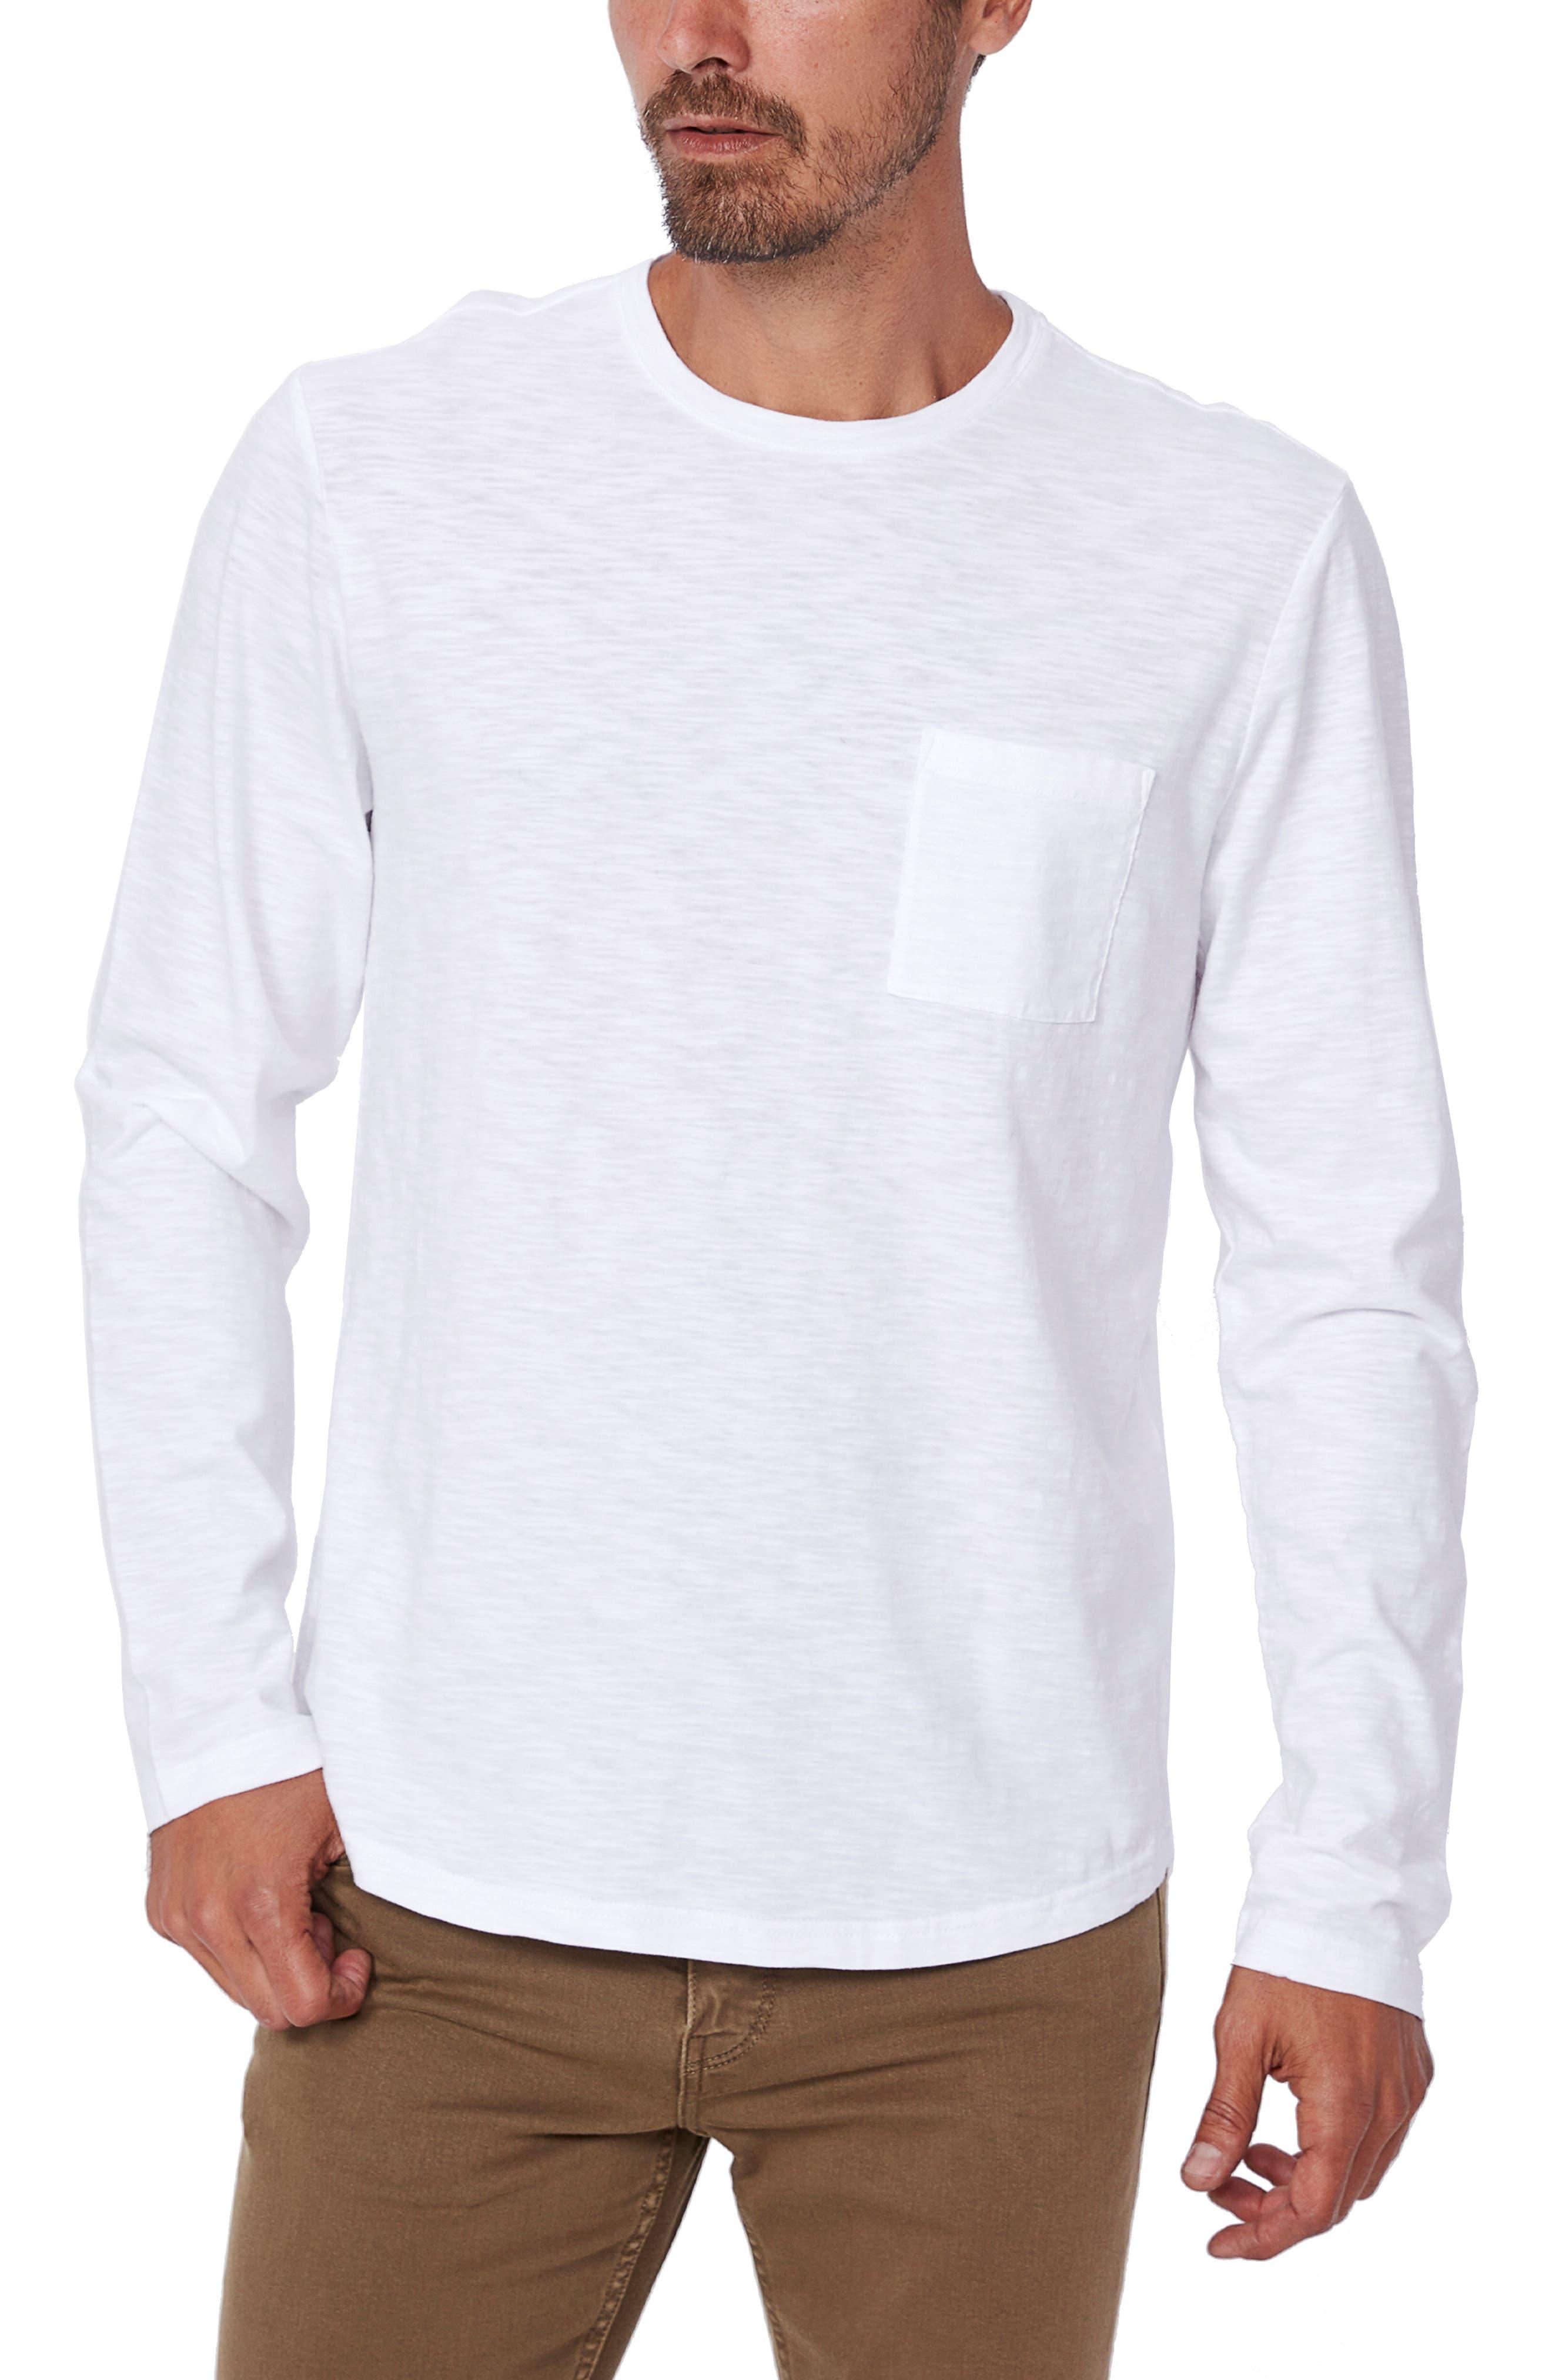 LL Bean Boys size L T-shirt Tee Solid Kids Shirt Top Long Sleeve Black Designer